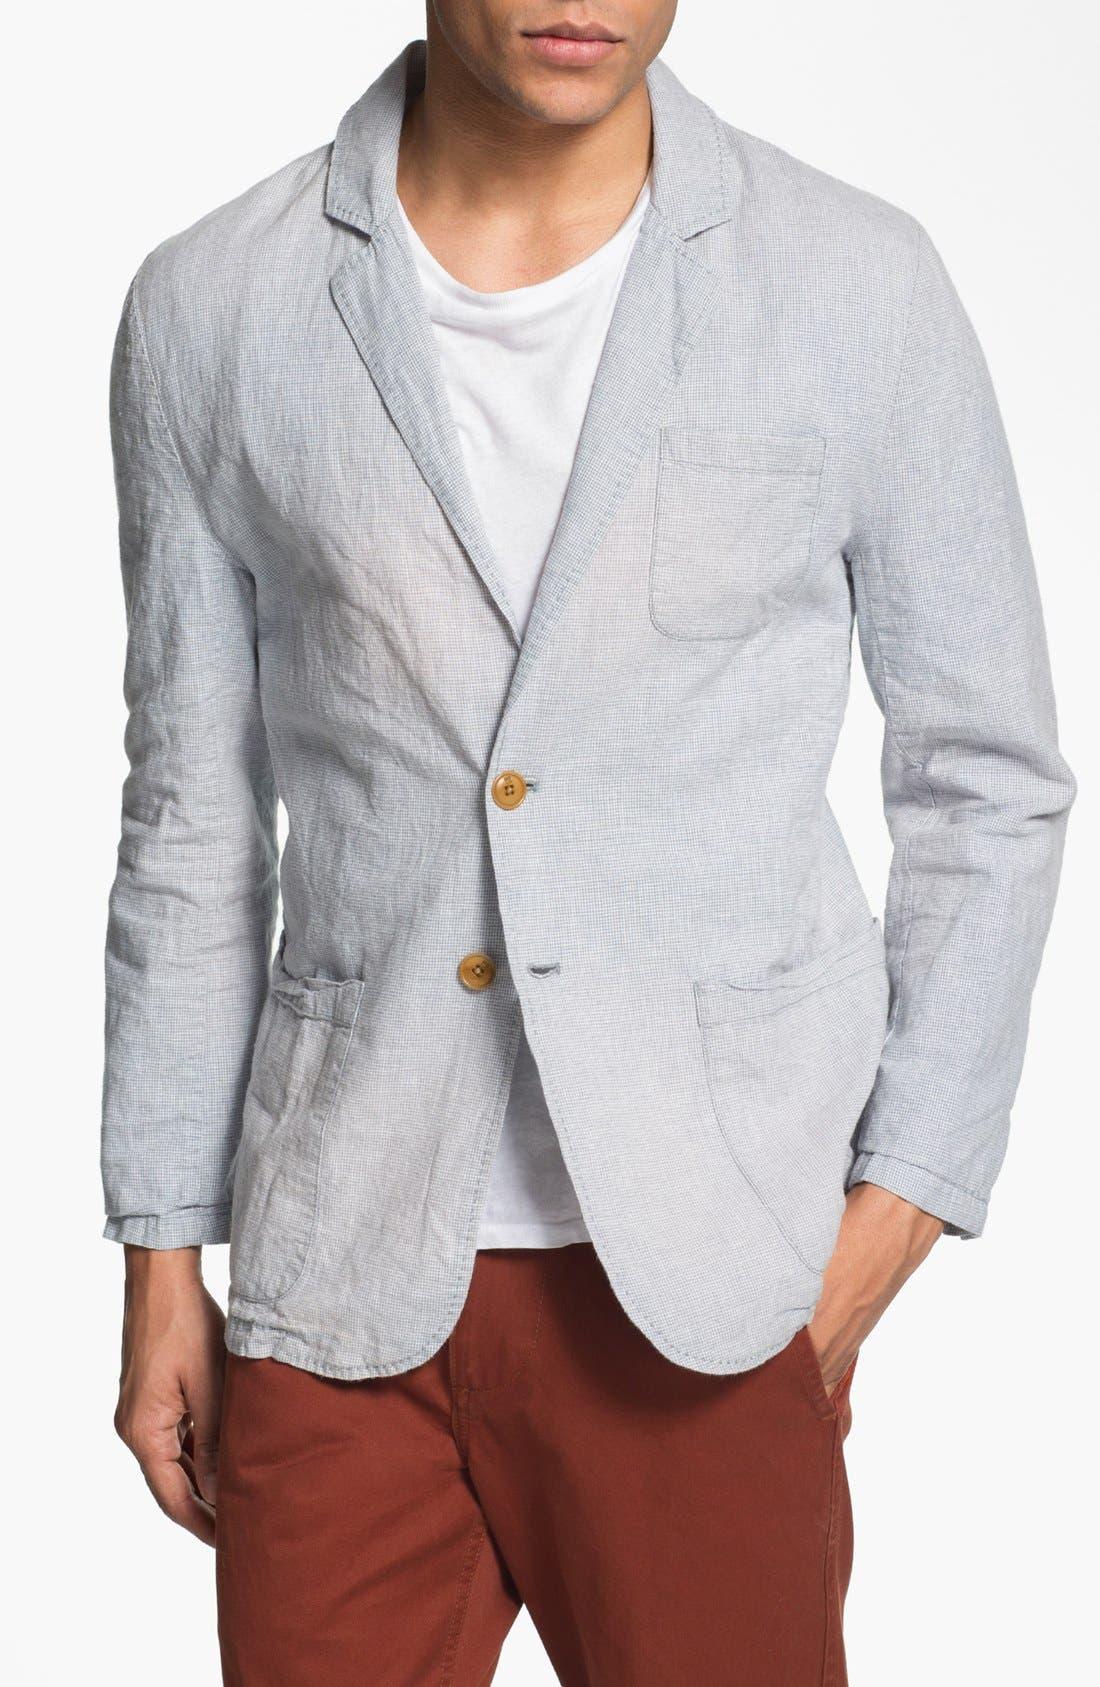 Main Image - Scotch & Soda Cotton & Linen Blazer